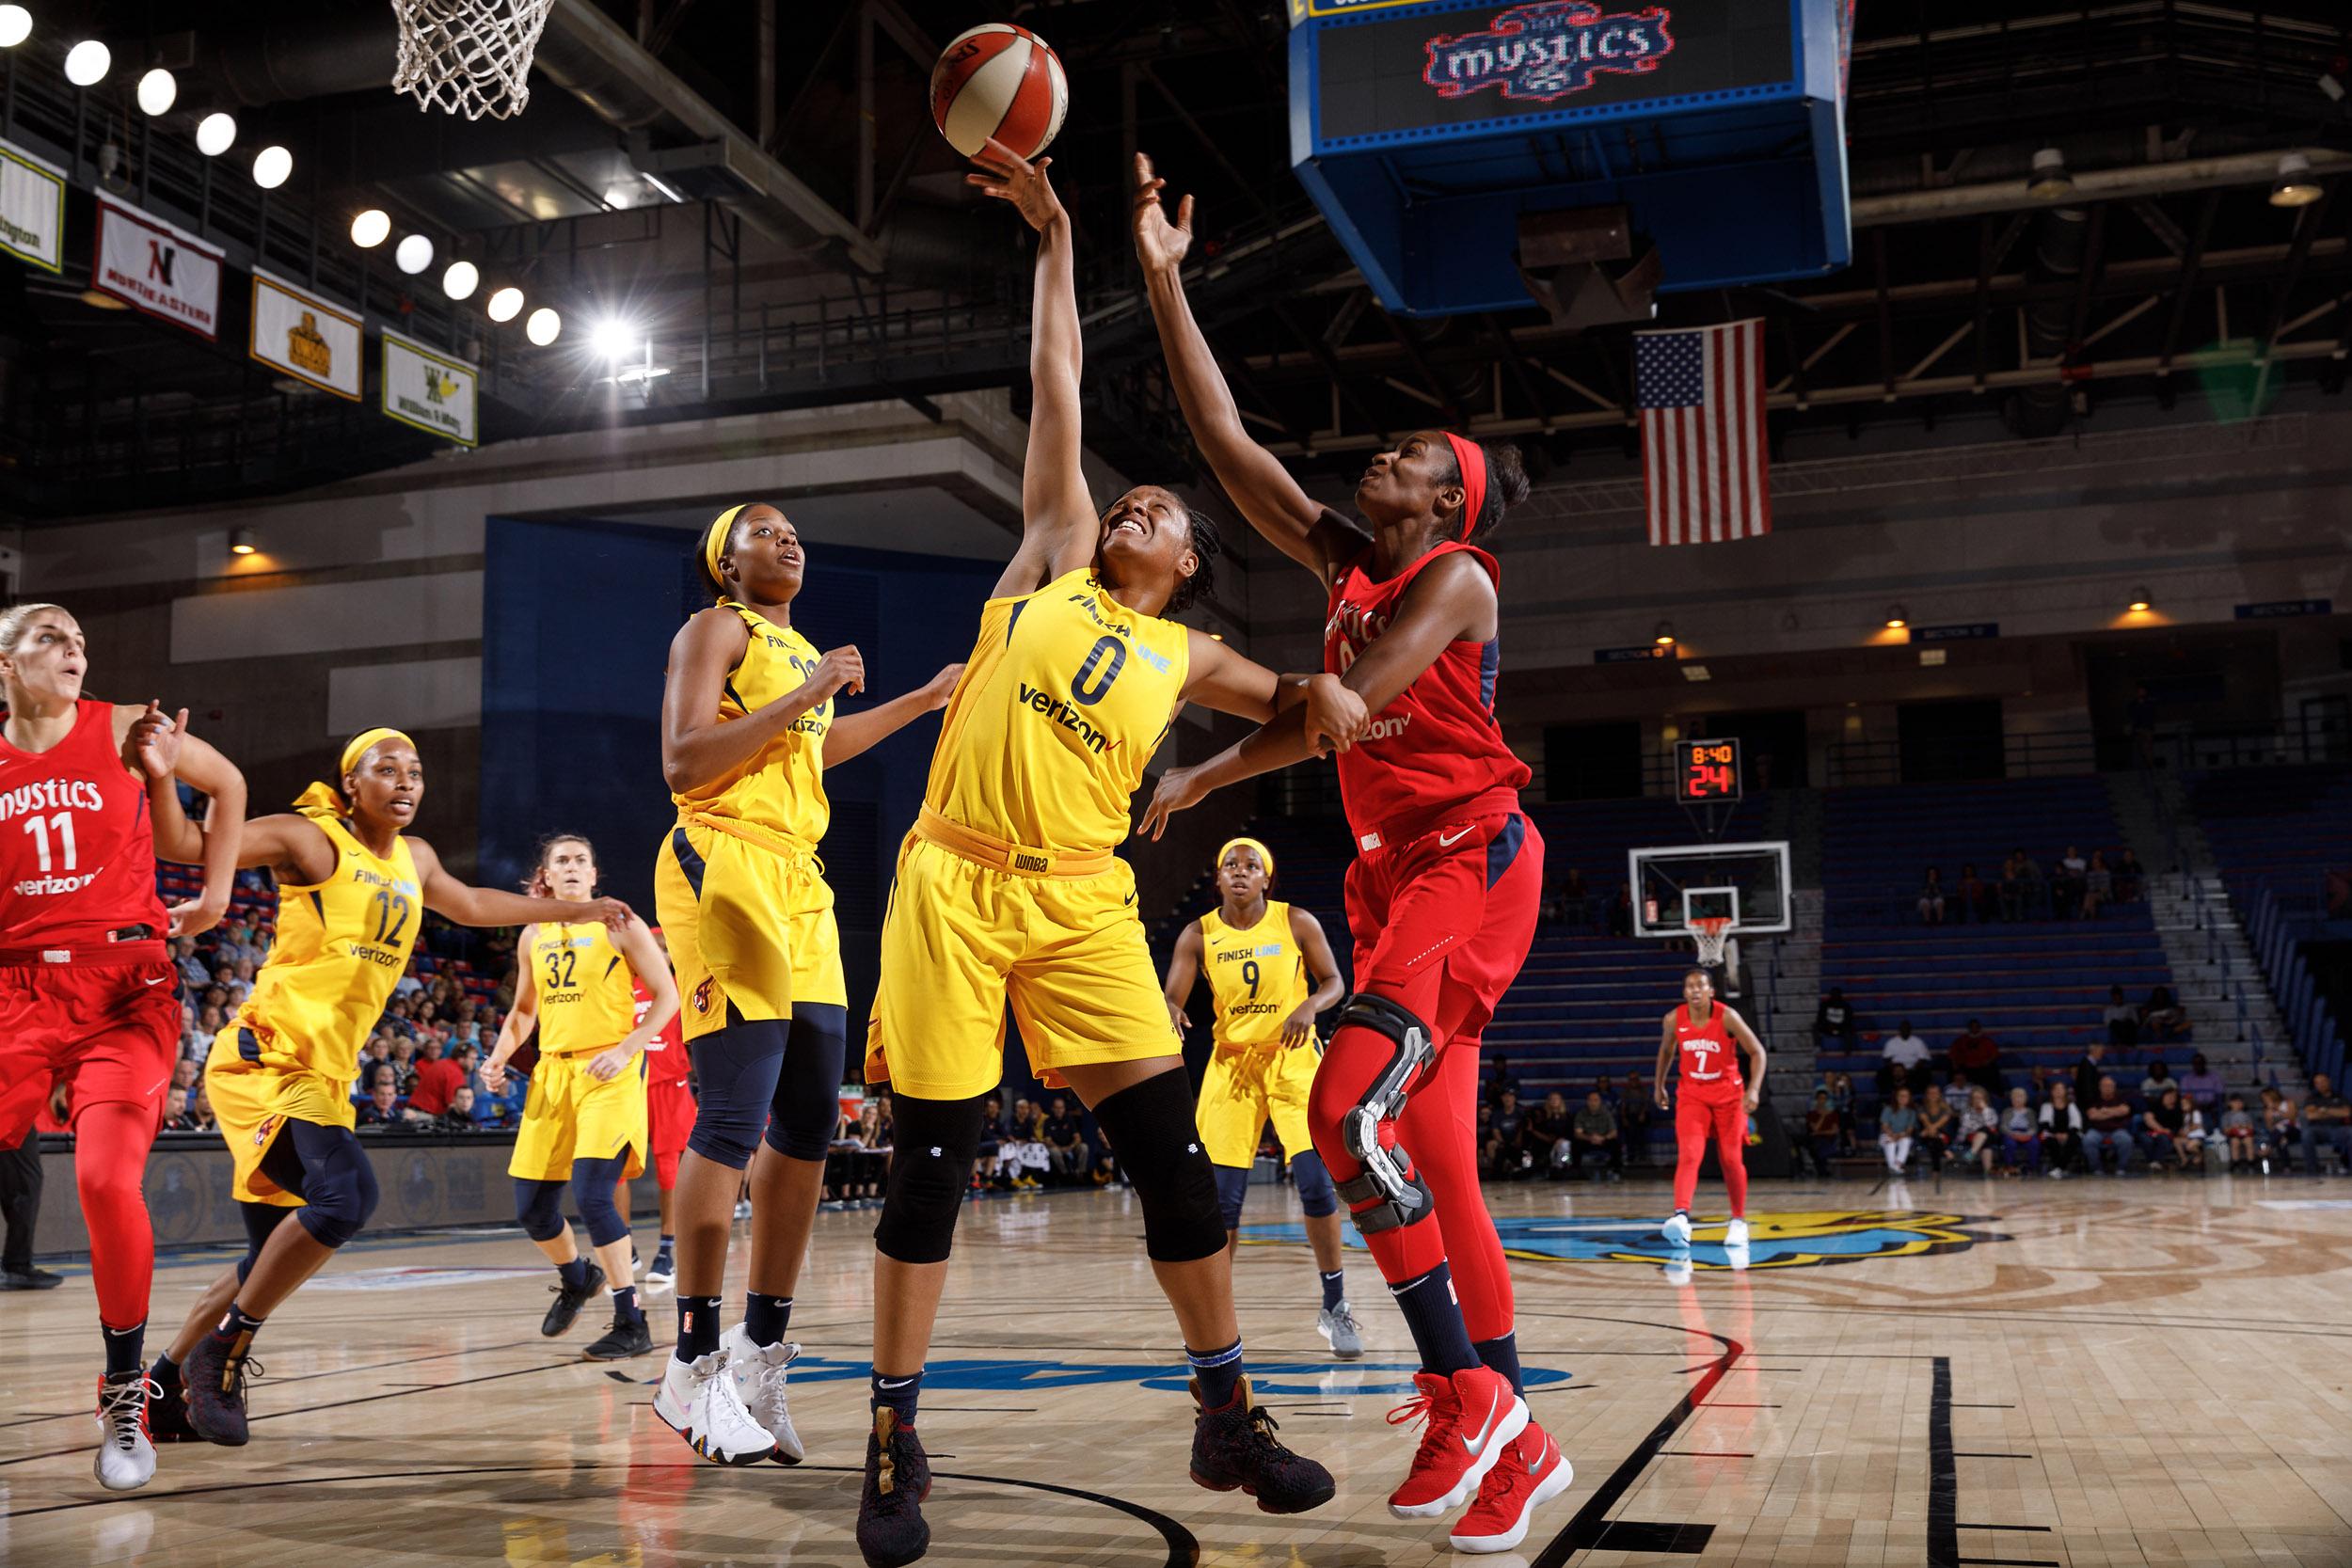 Fever-Mystics-Delaware-12may2018-WNBA-Gosling-11.JPG